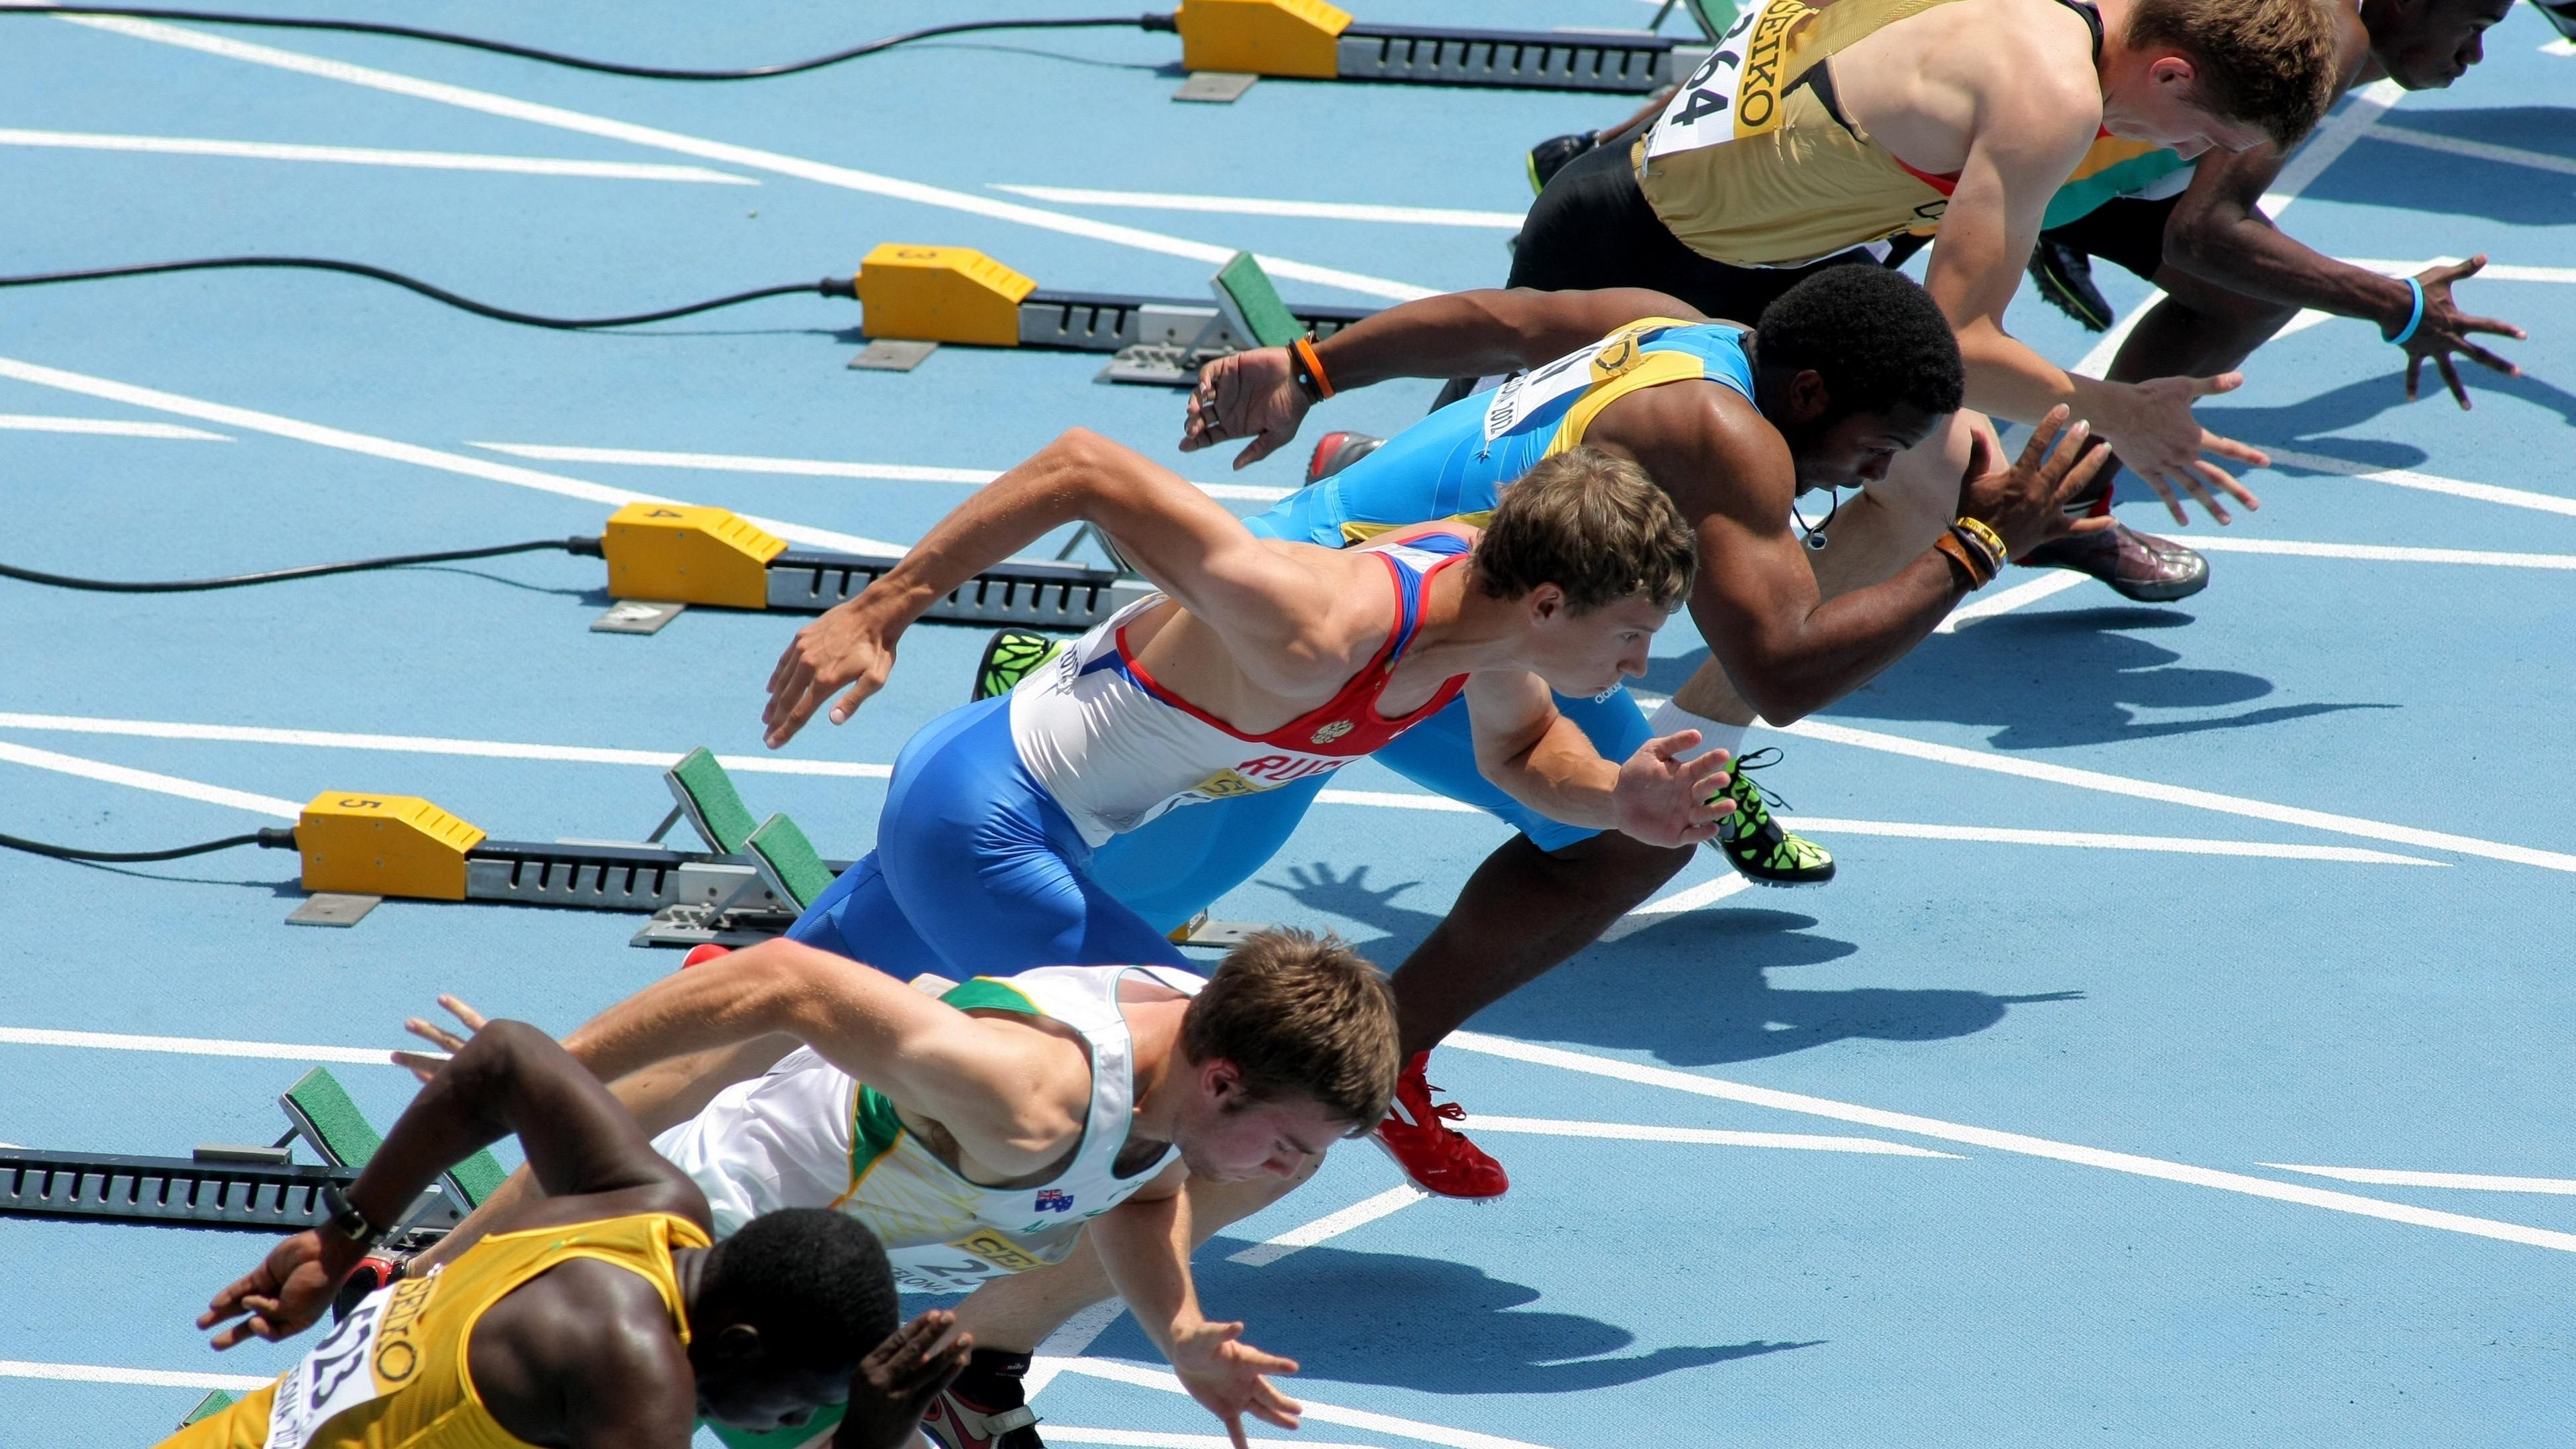 runners moment start 4k 1540062140 - runners, moment, start 4k - start, runners, Moment